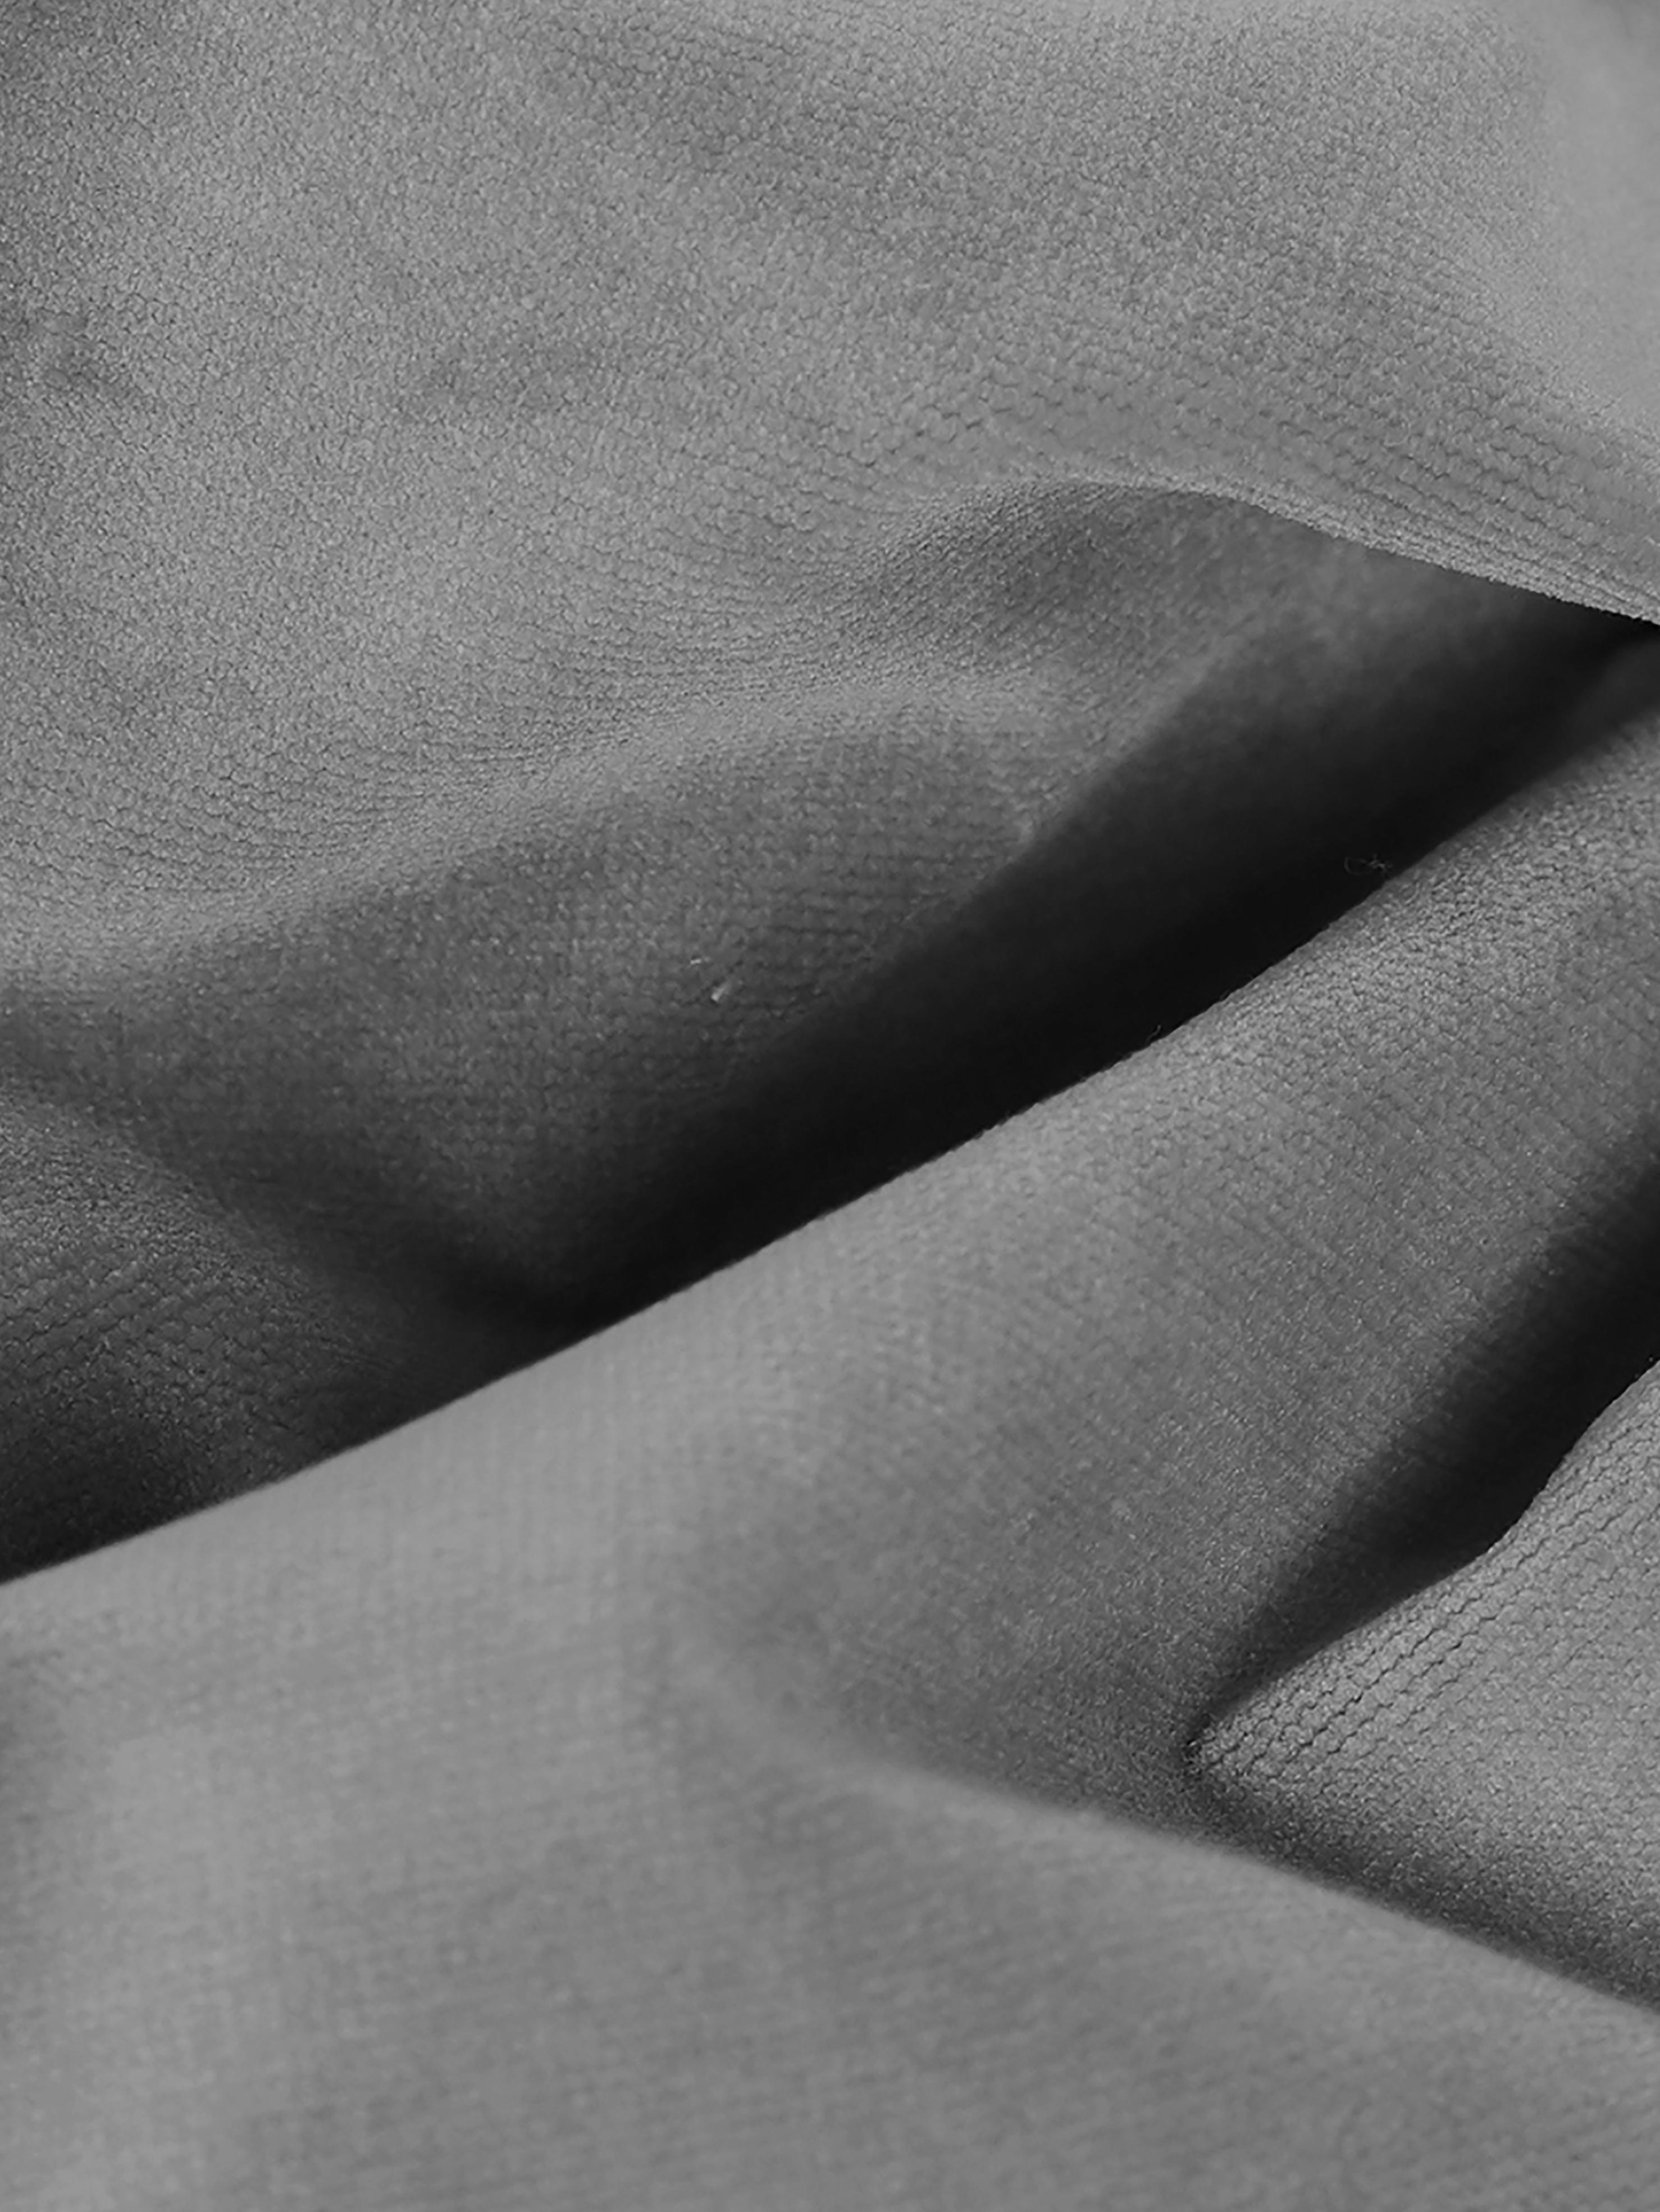 Samt-Ecksofa Moby, Bezug: Samt (Hochwertiger Polyes, Gestell: Massives Kiefernholz, Füße: Metall, pulverbeschichtet, Samt Grau, B 280 x T 160 cm